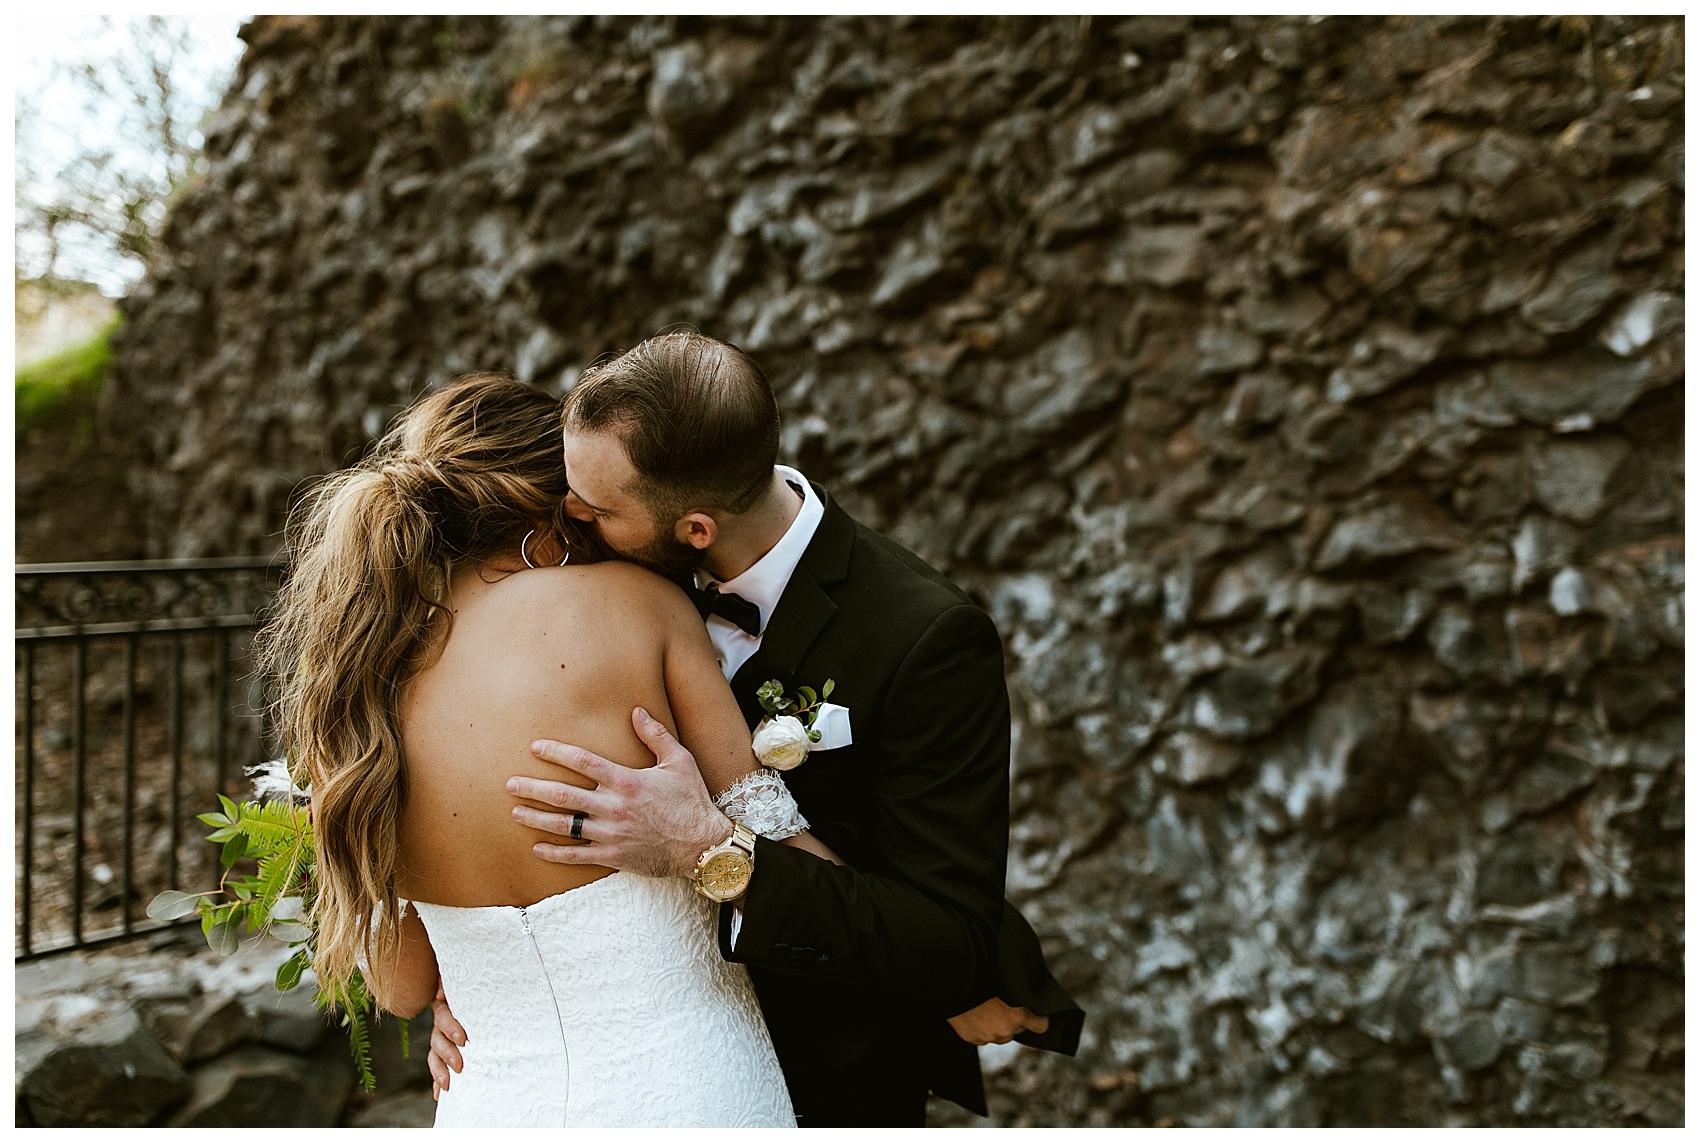 Chateau Rive Spokane Wedding Cassie Trottier Photography01074.jpg